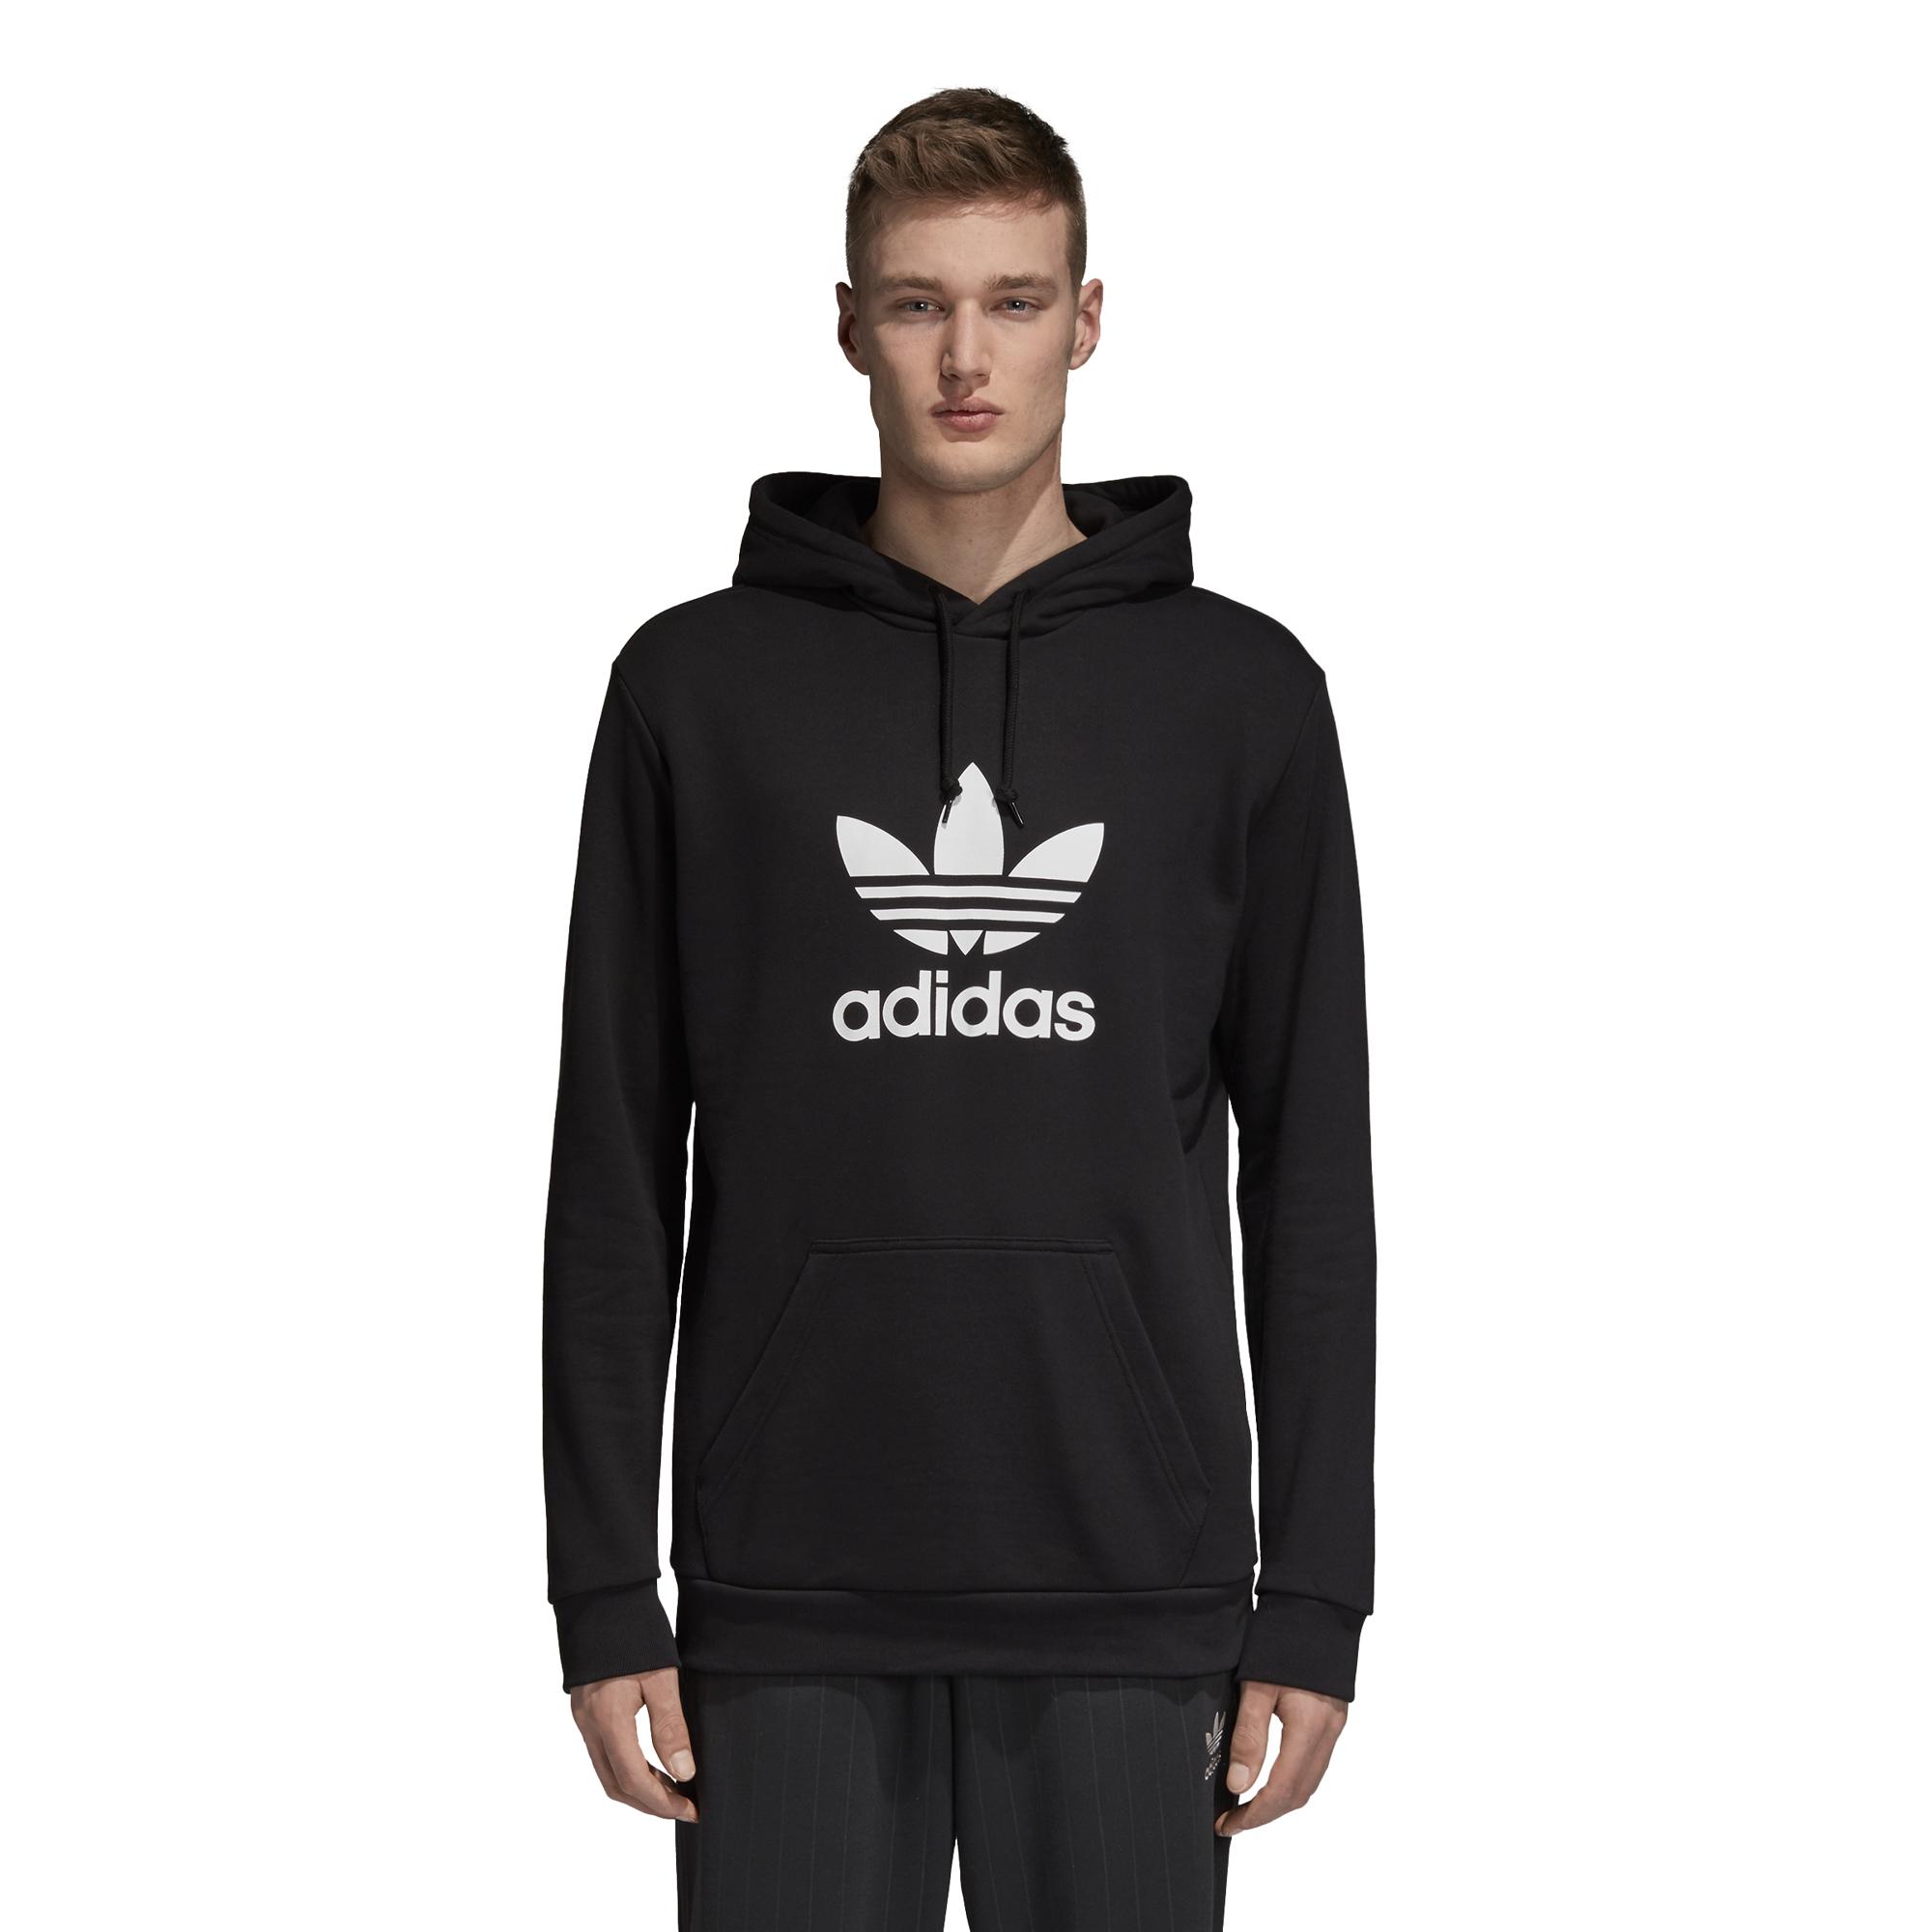 Bluza adidas Originals Anorak Hoodie BS4528 Ceny i opinie Ceneo.pl